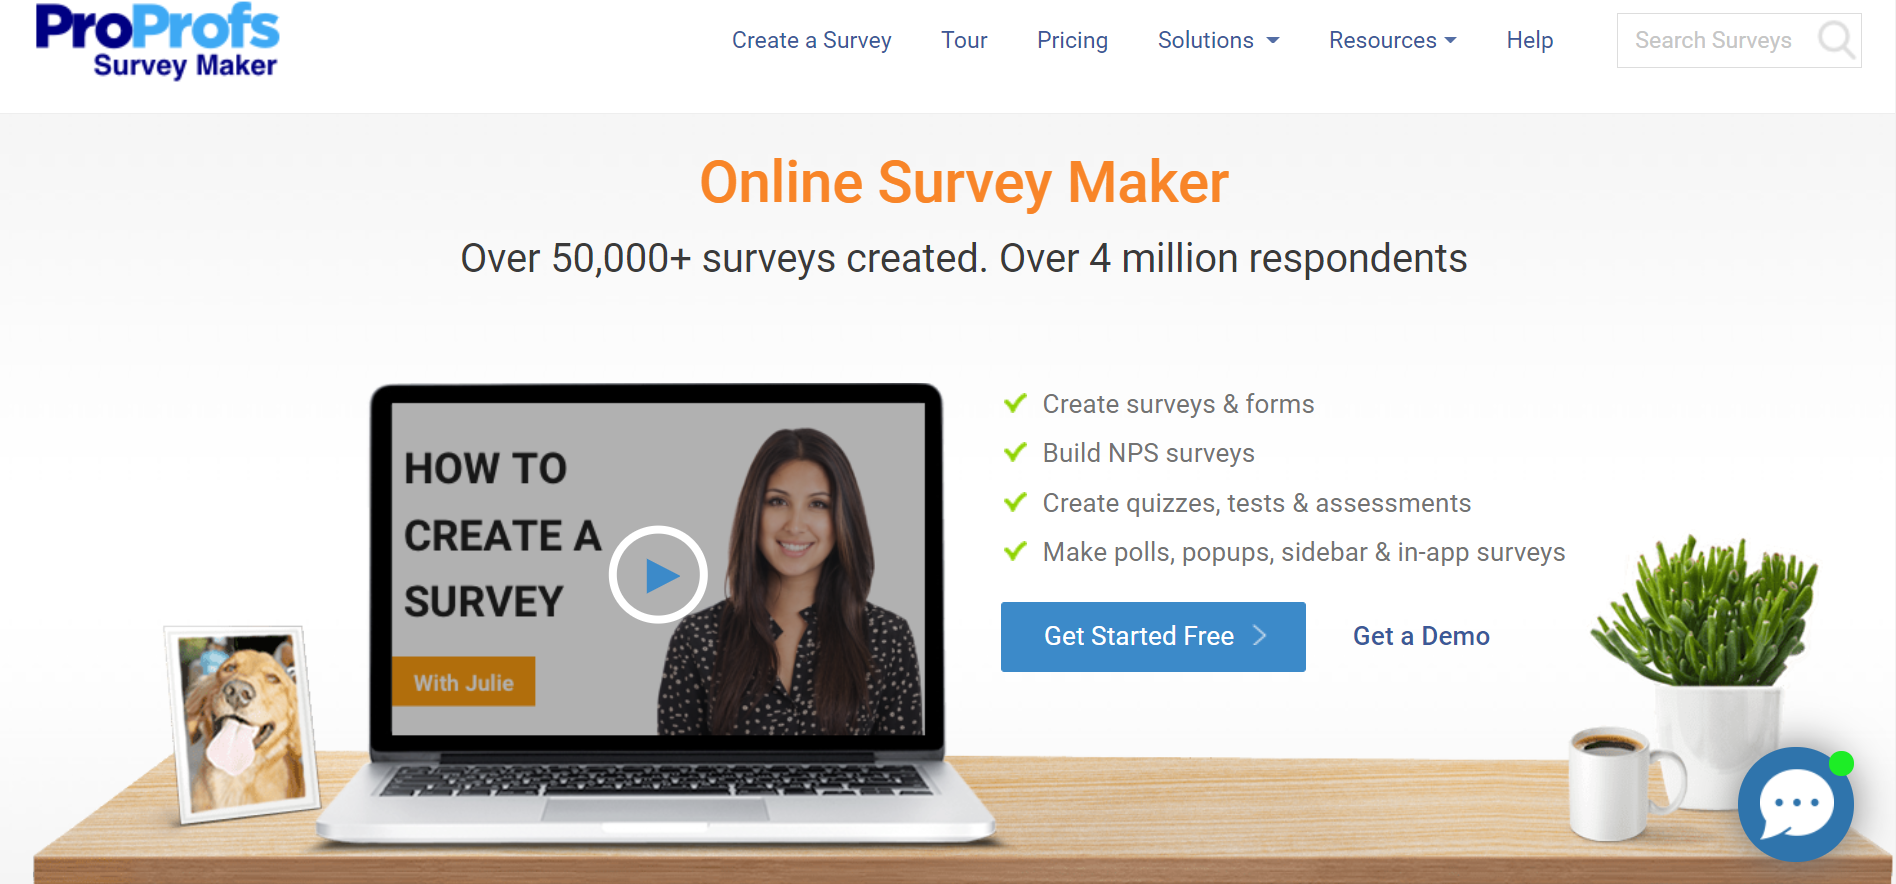 ProProfs Survey Maker Hero Image